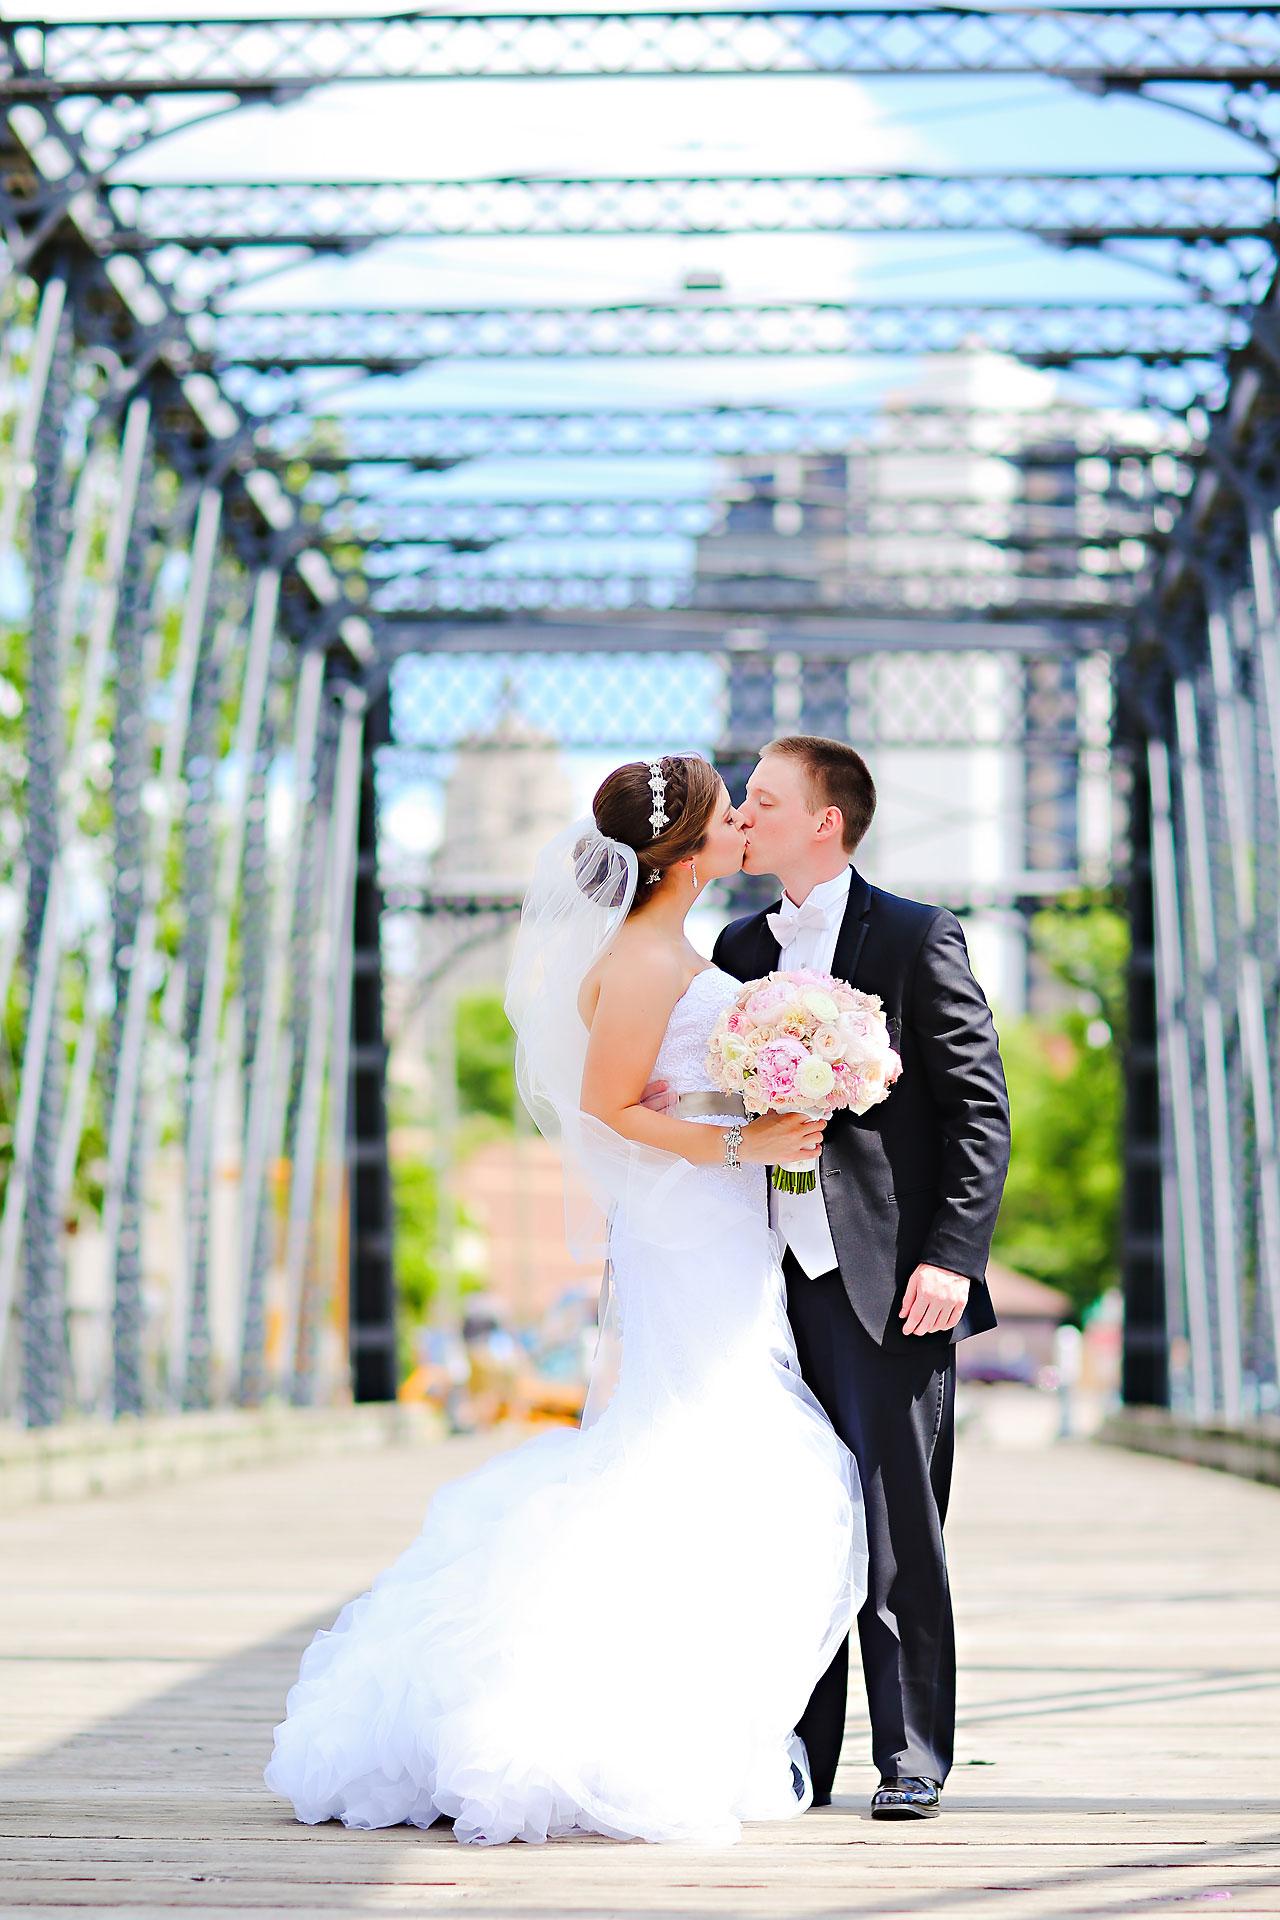 Emmy Benji Emyprean Fort Wayne Wedding 160